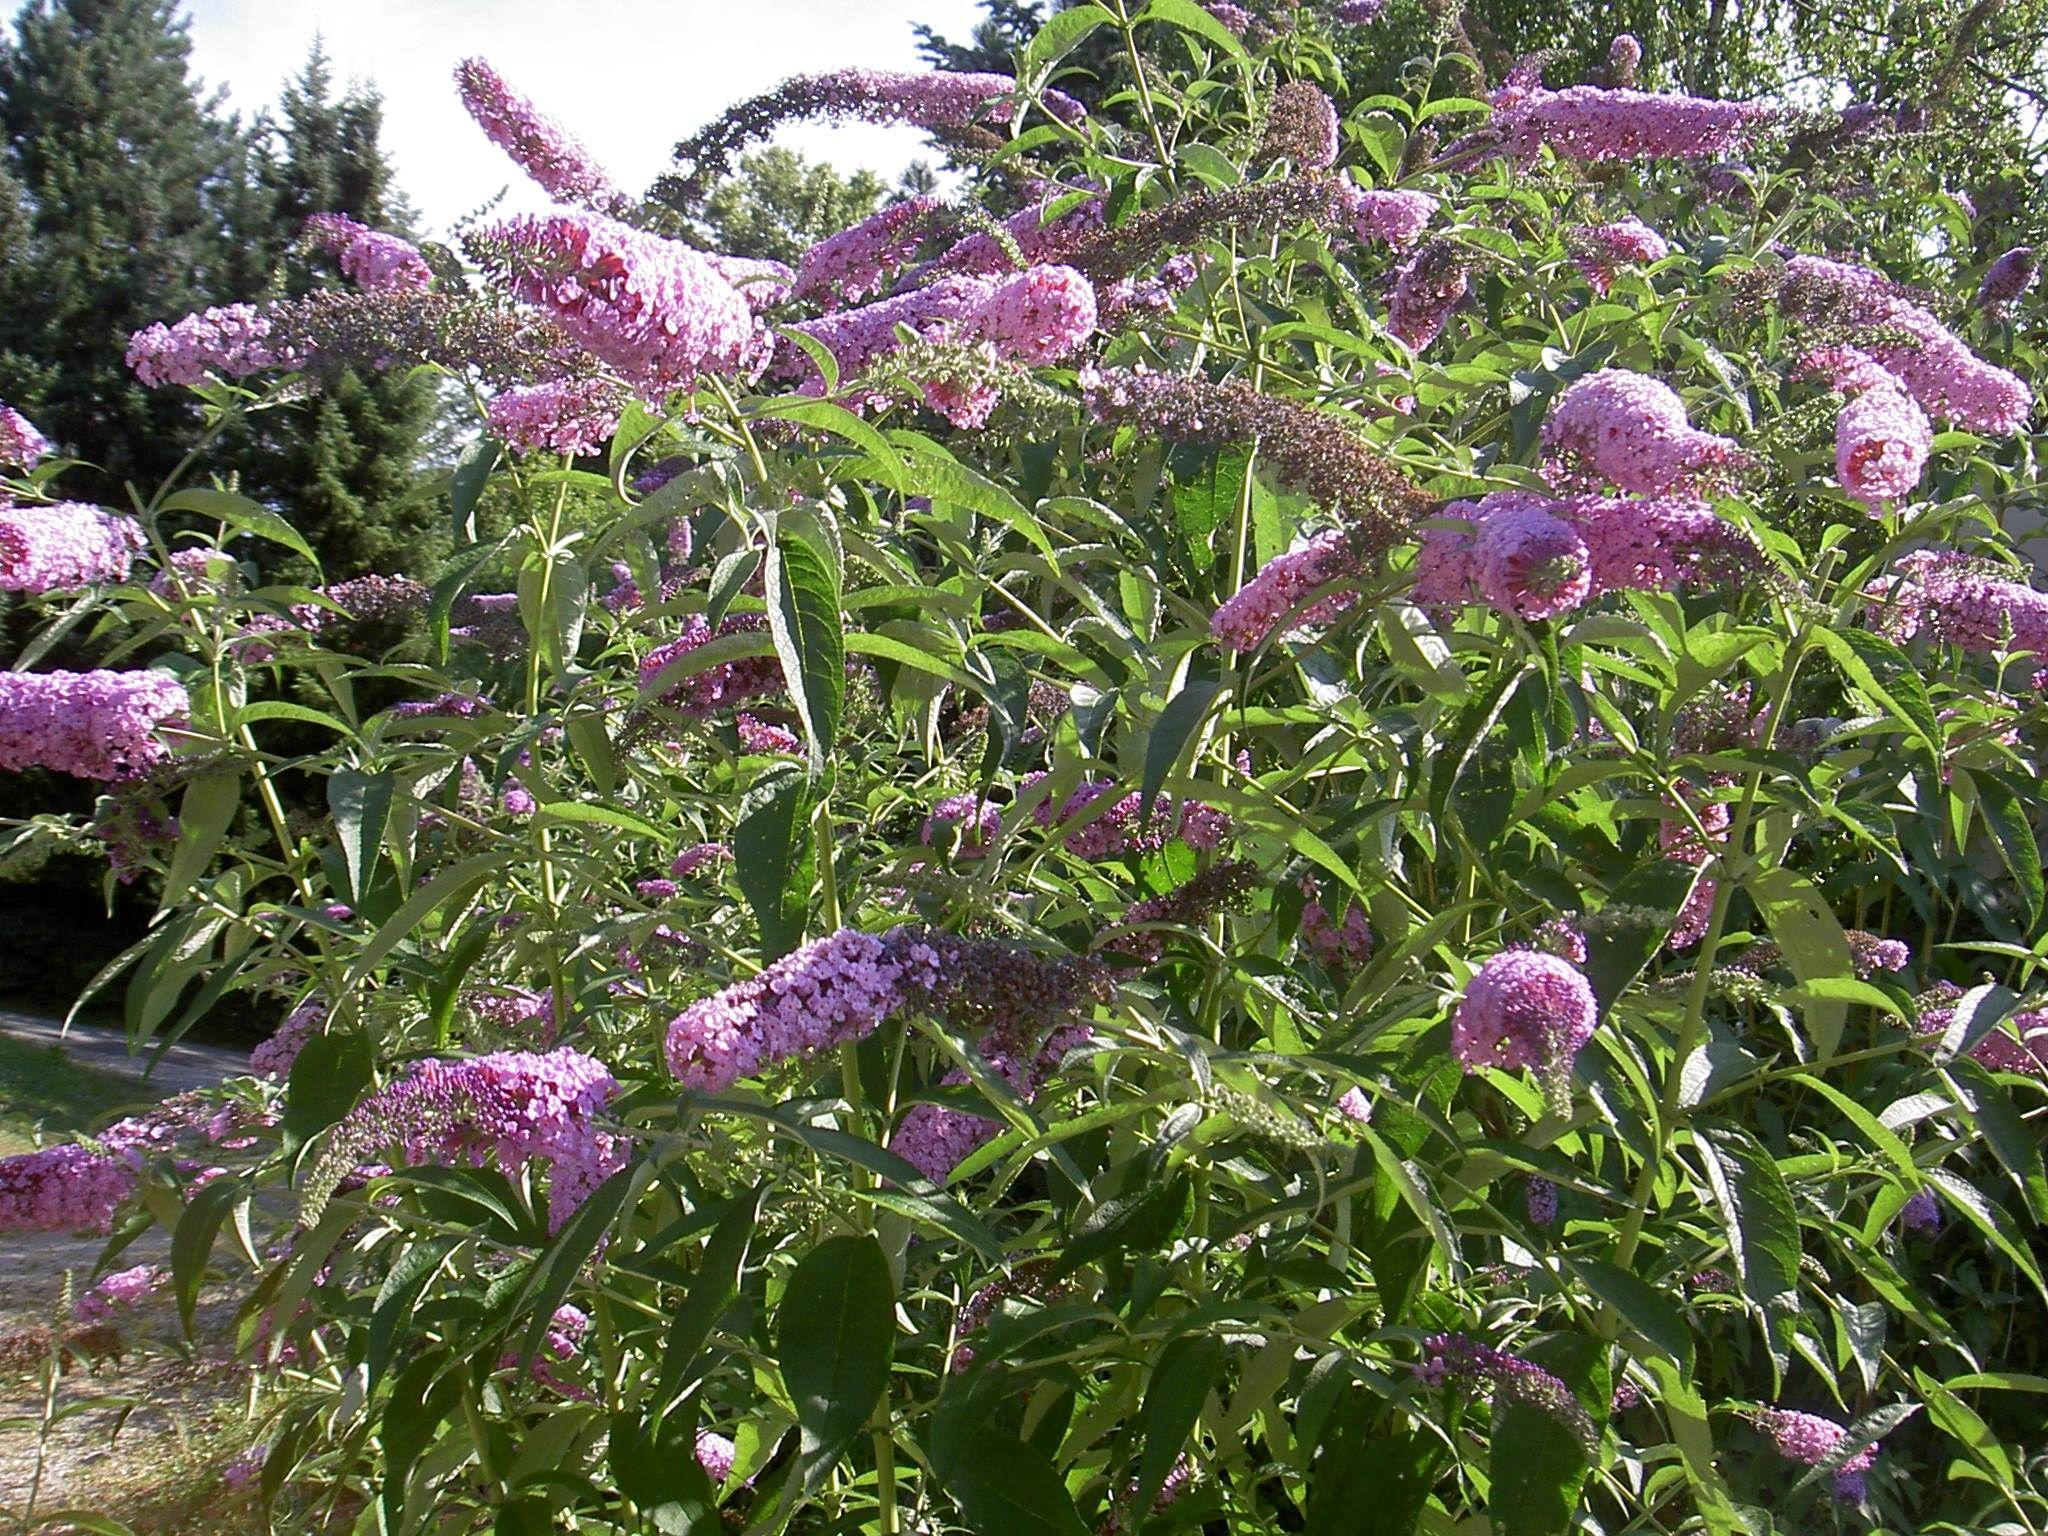 Buddleja Davidii Spelling Variant Buddleia Davidii Also Called Summer Lilac Butterfly Bush Or Orange Eye Is A Species Planten Vlinderstruik Vaste Planten